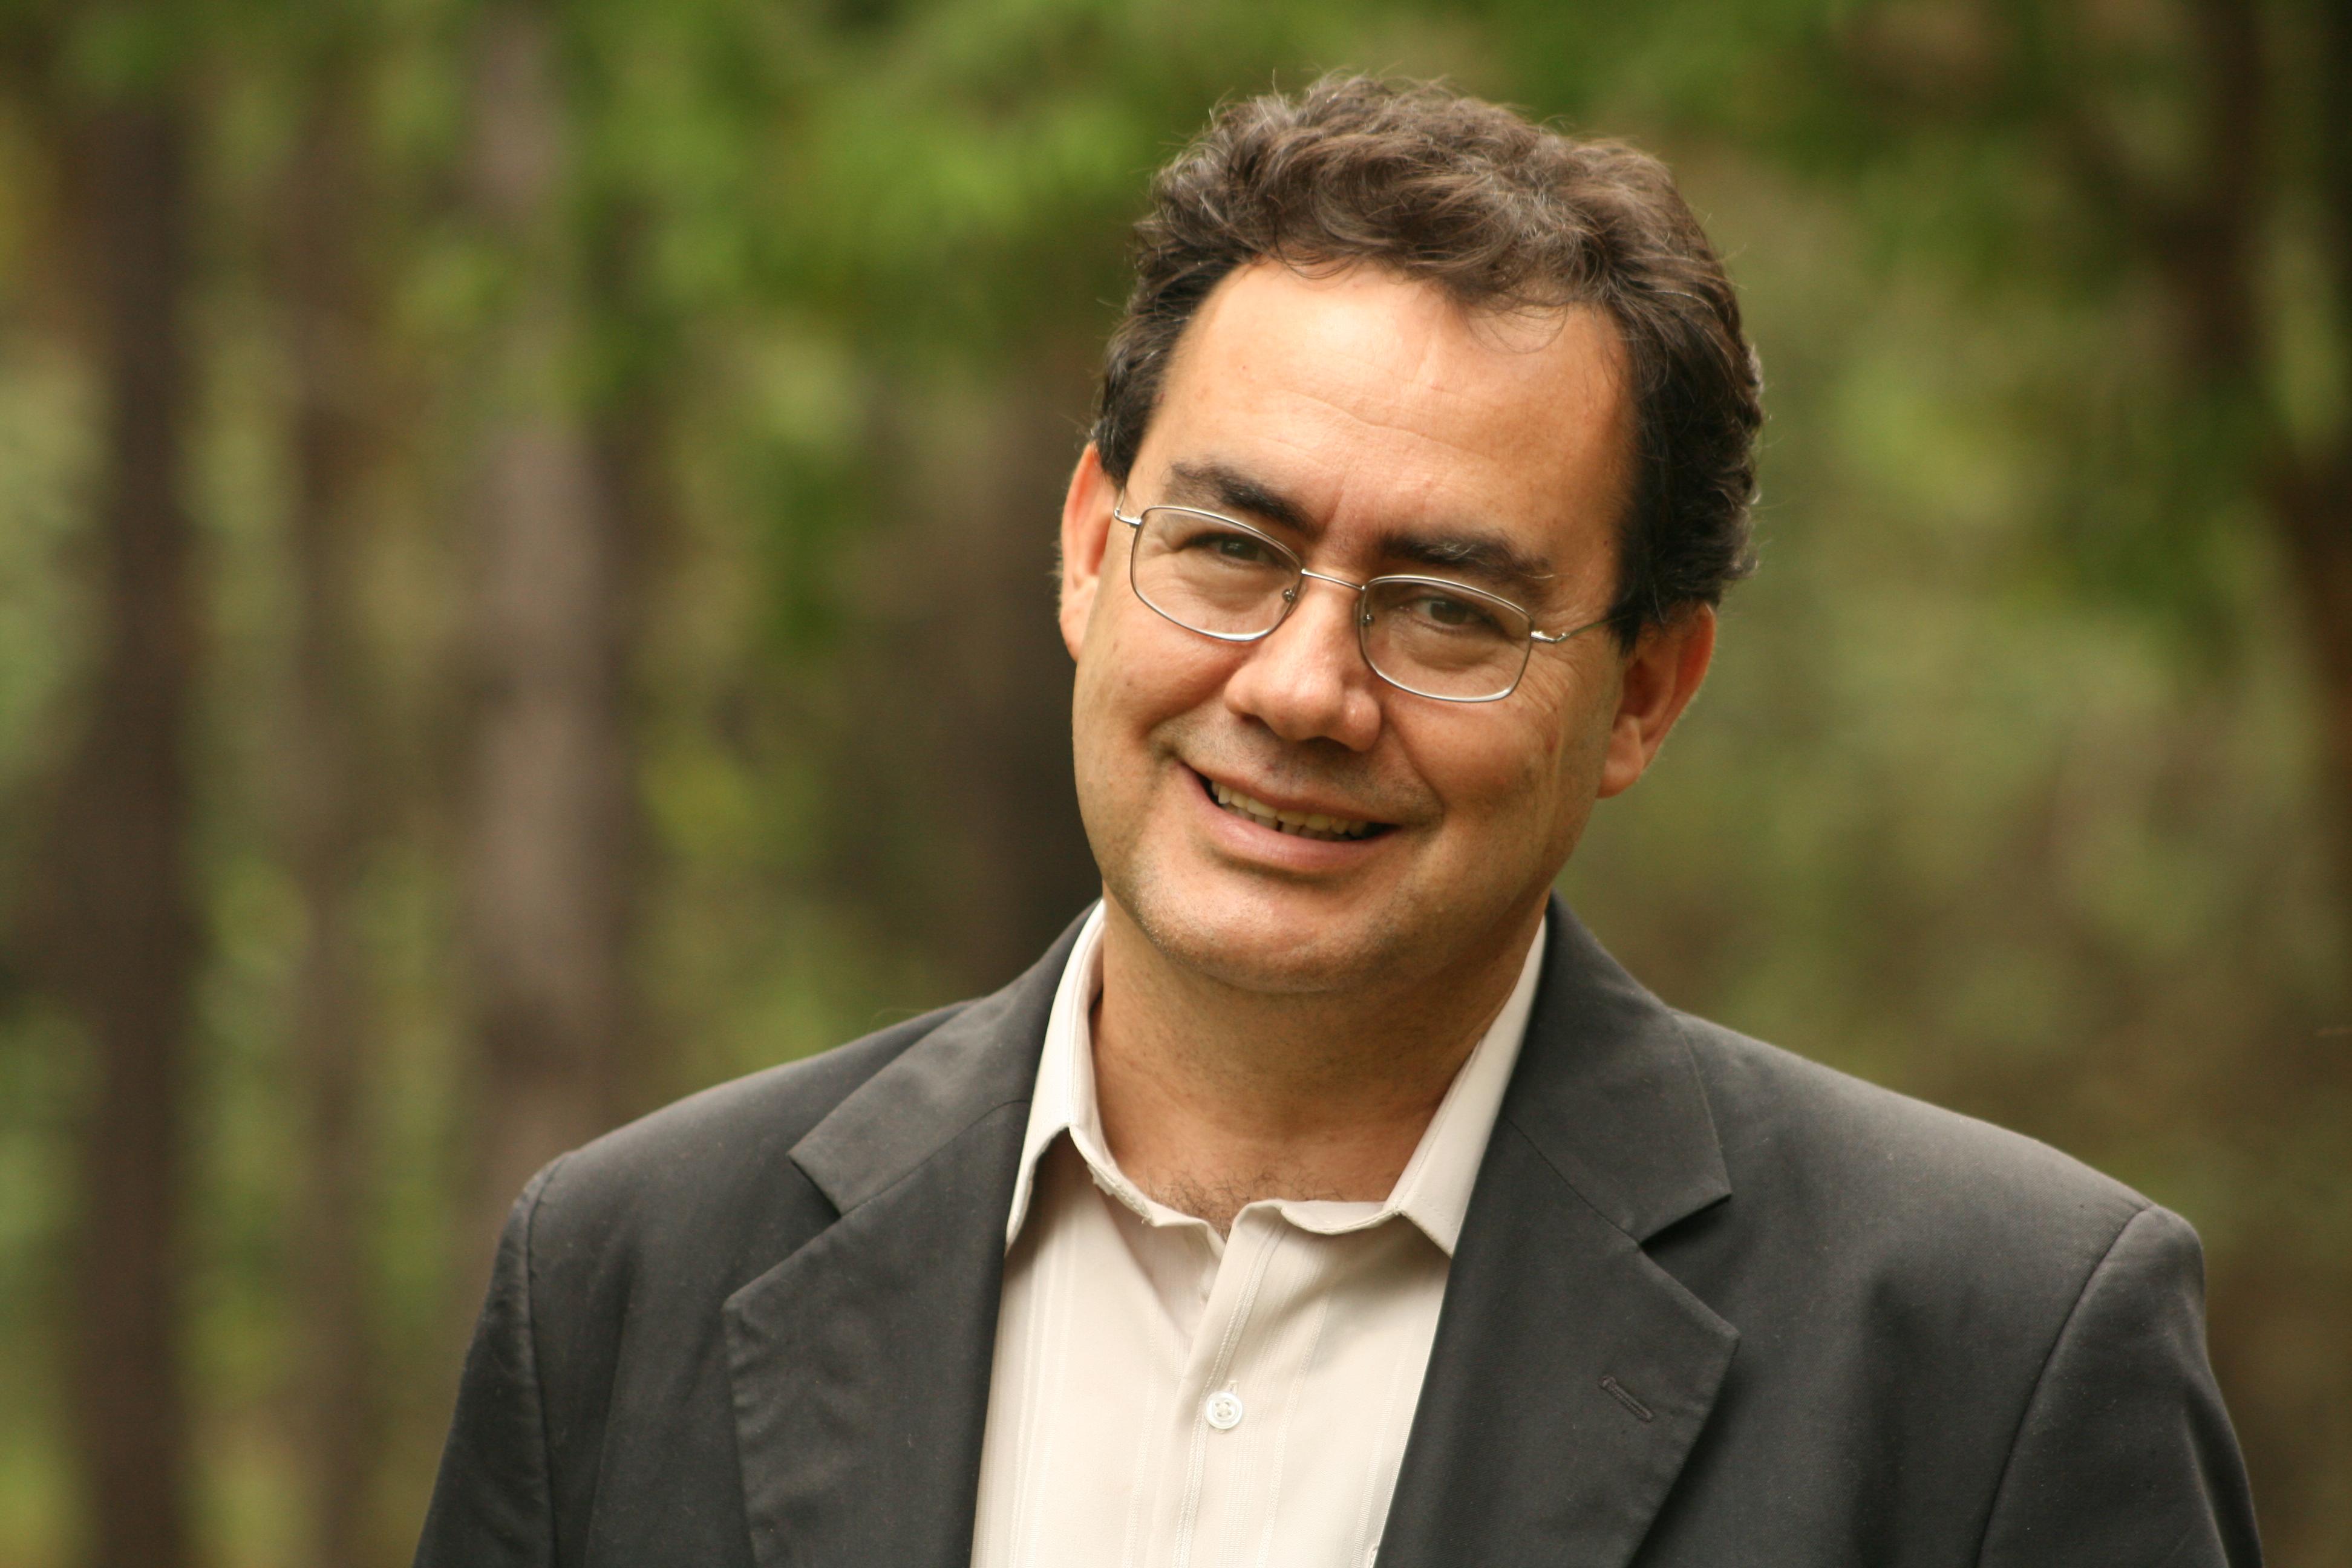 Augusto Cury si Inteligenţa multifocală